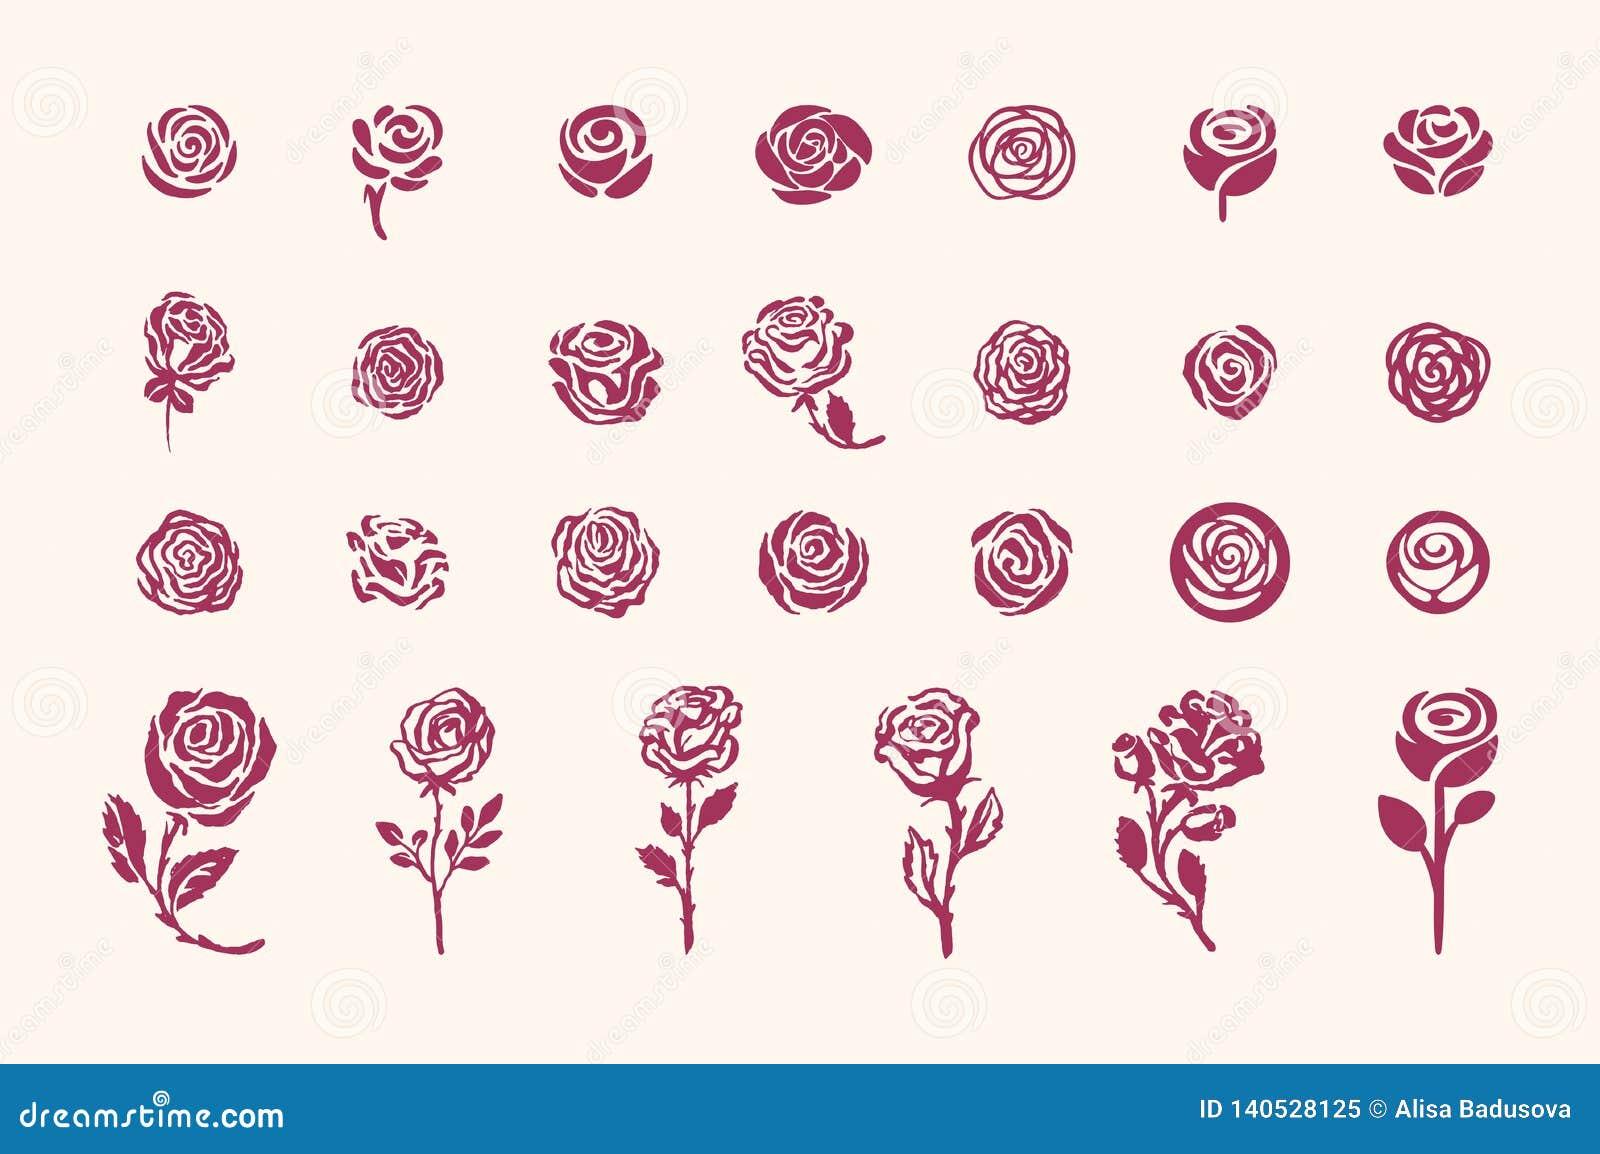 Vector hand drawn rose symbol simple sketch illustration on light background